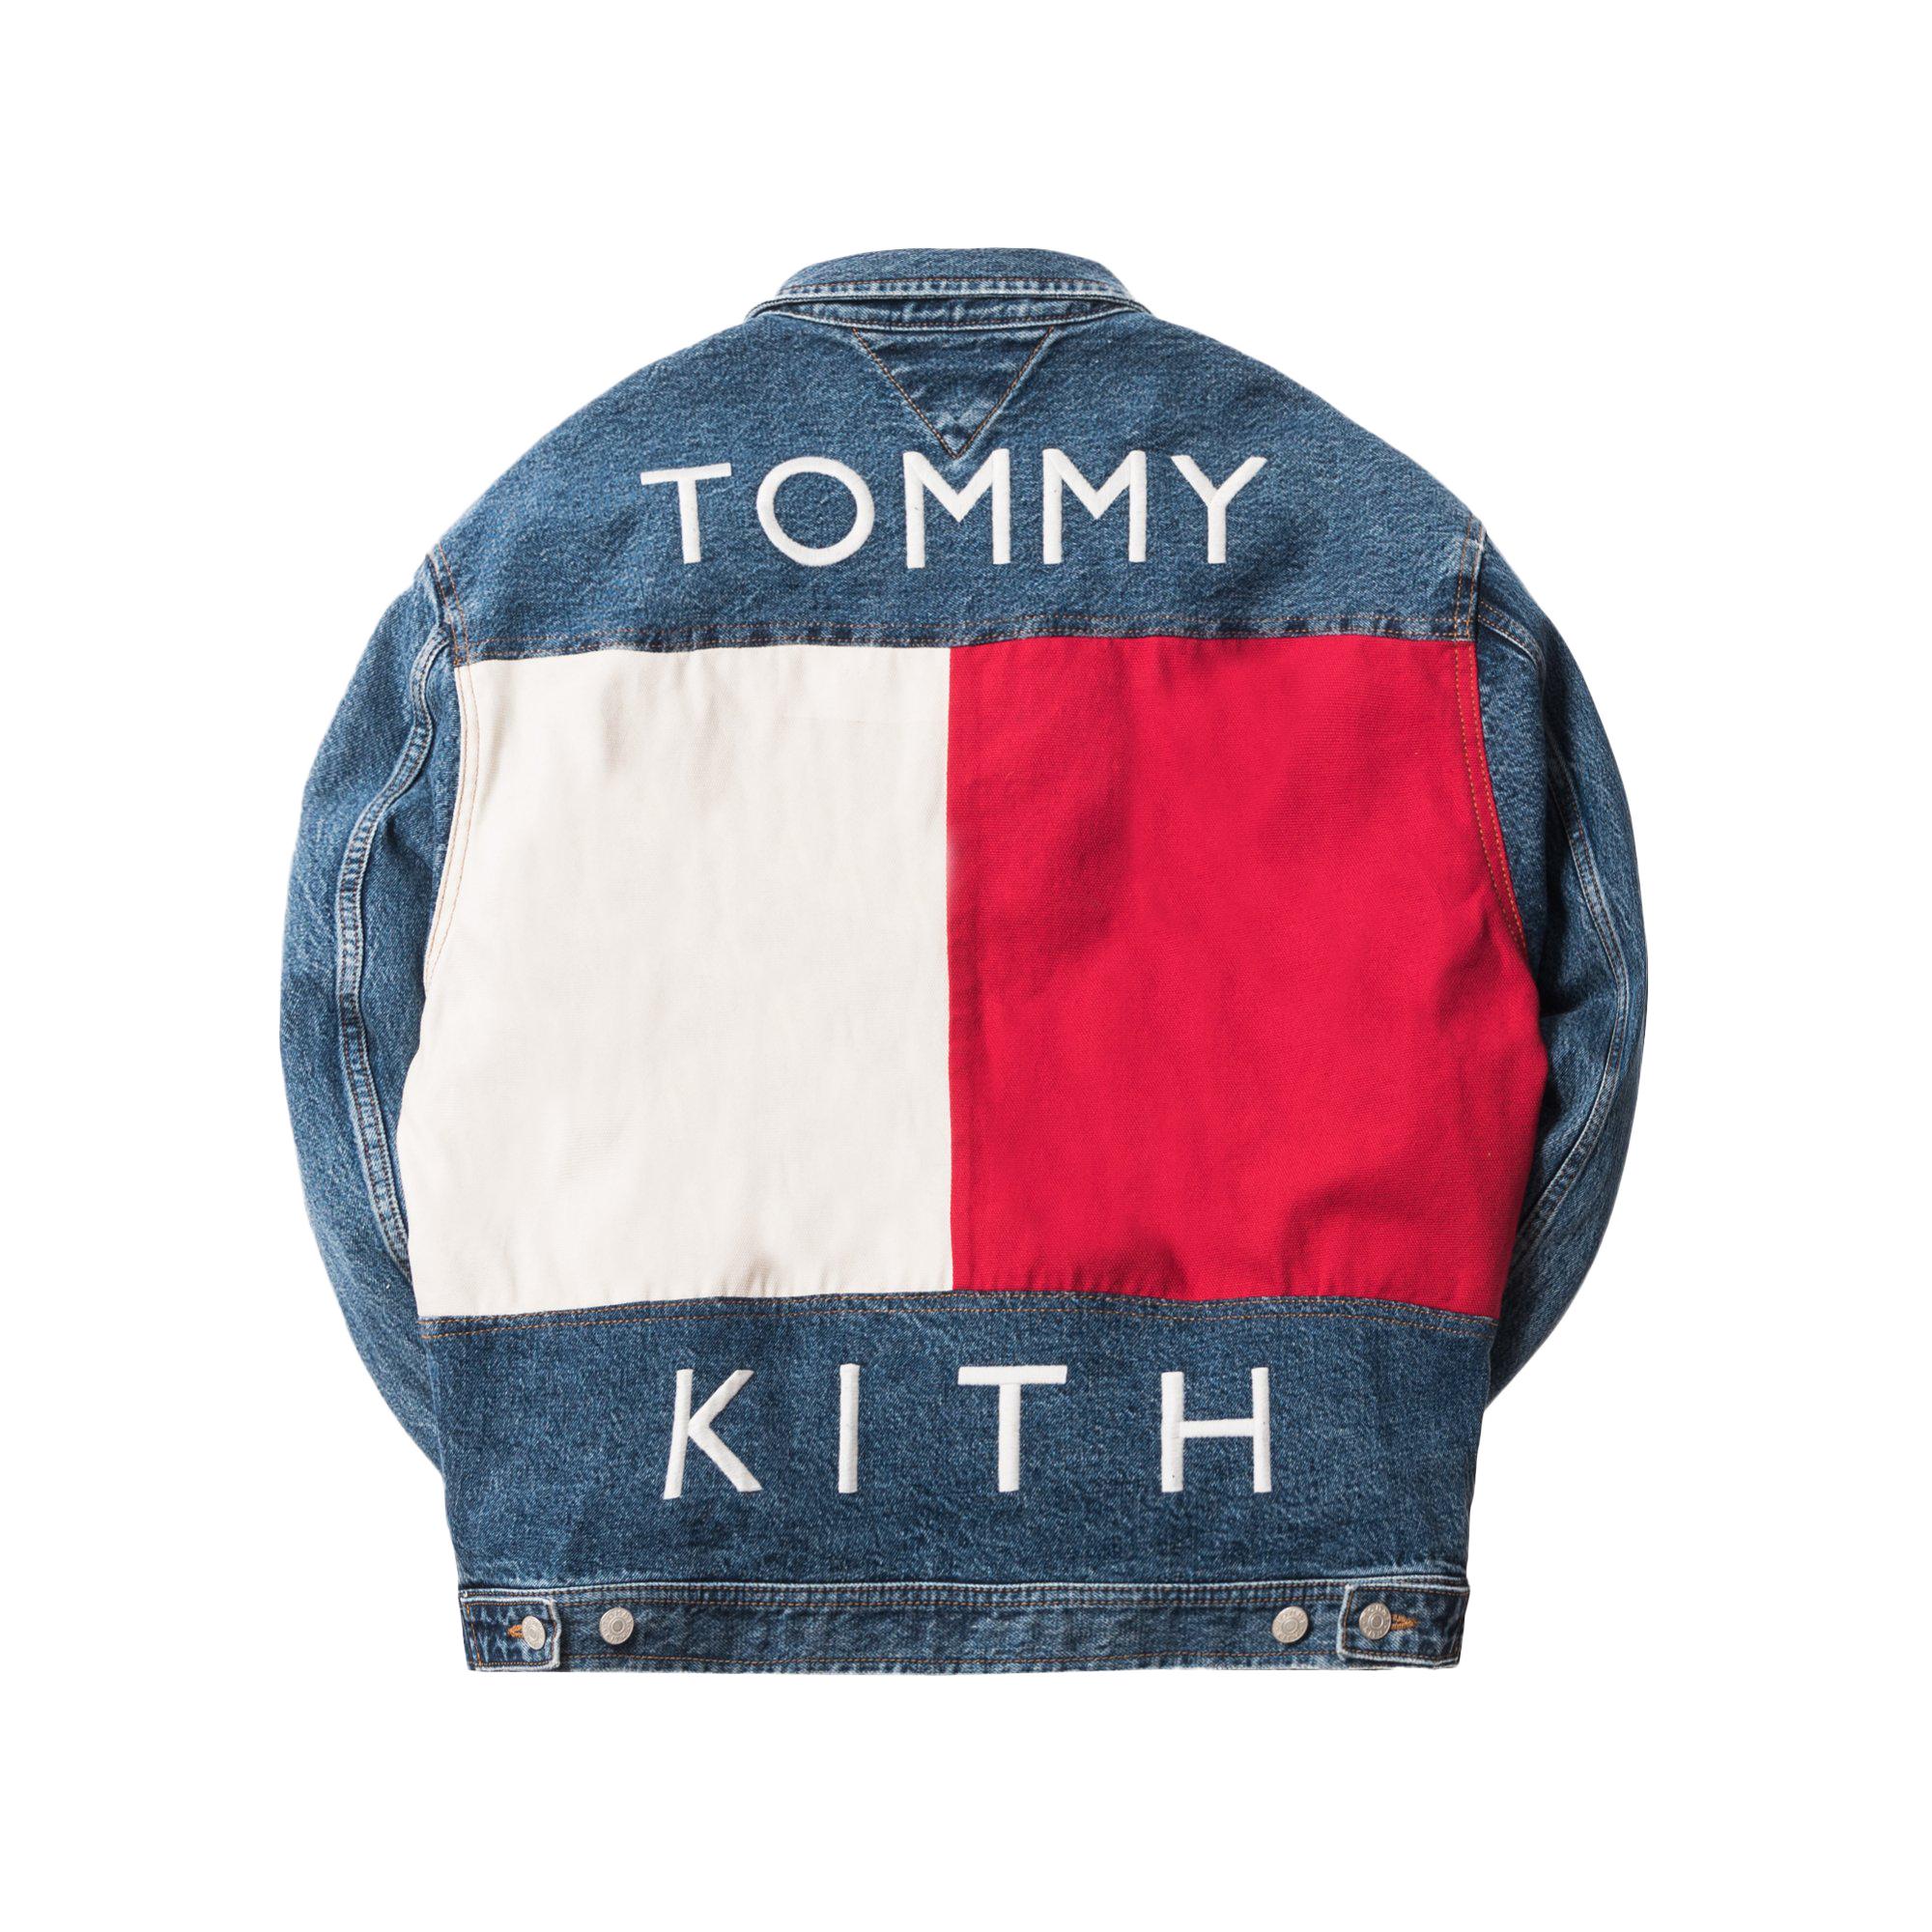 20cd67a1d3fd Kith tommy hilfiger denim trucker jacket vintage blue jpg 1400x1000 Tommy  hillfiger